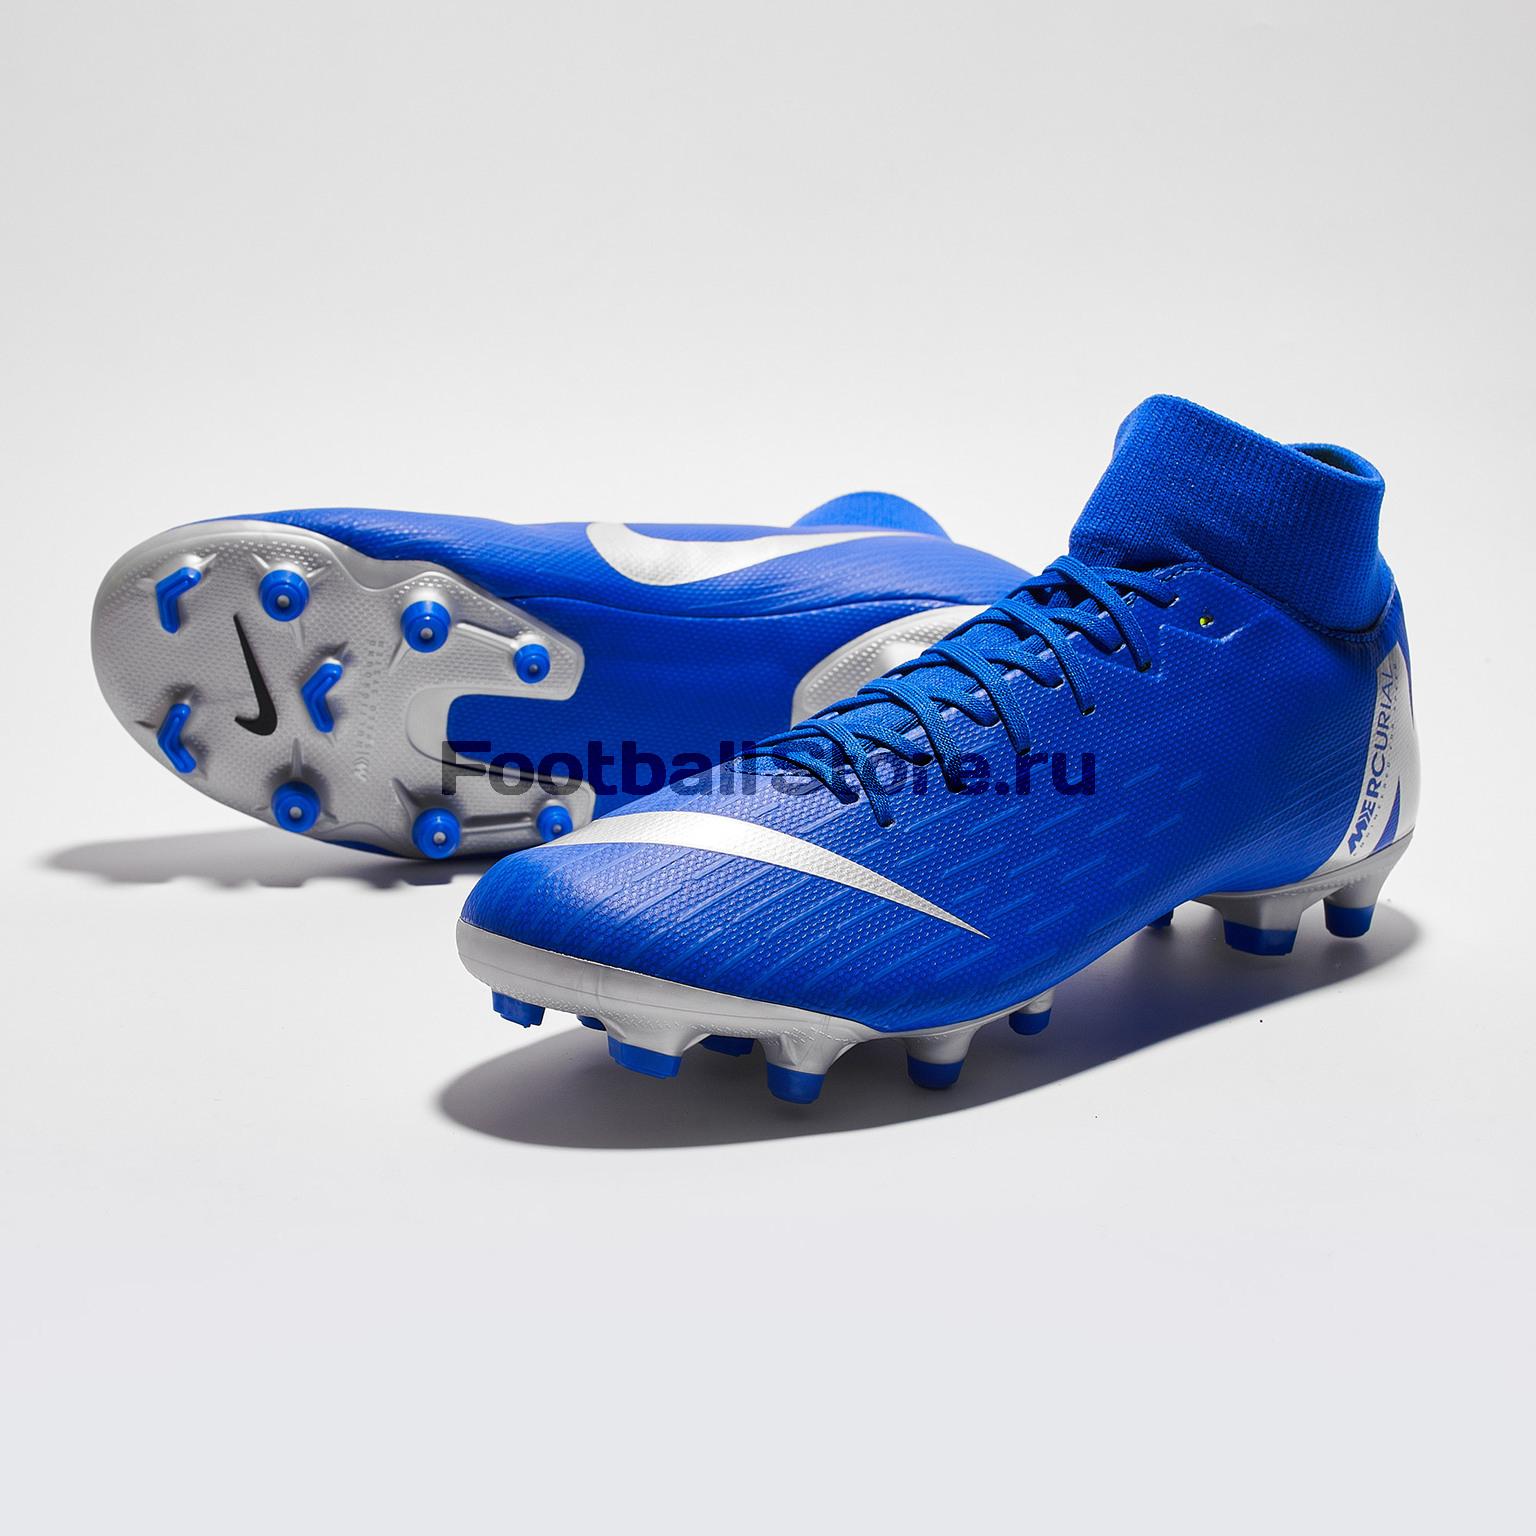 Бутсы Nike Superfly 6 Academy FG/MG AH7362-400 бутсы детские nike superfly 6 academy gs fg mg ah7337 060